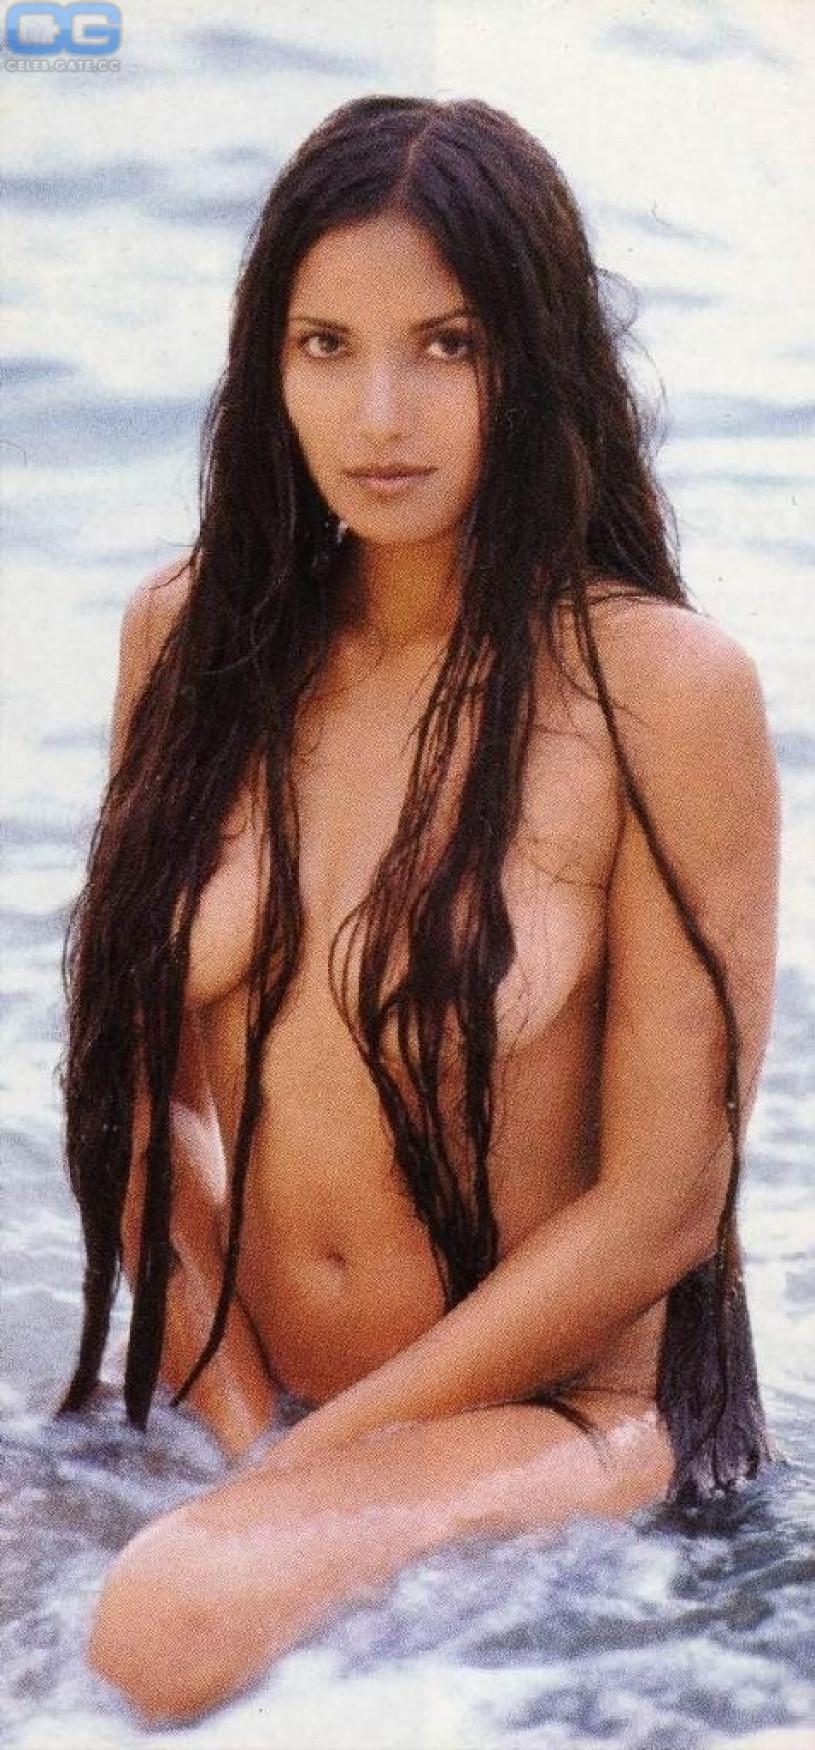 SELMA: Teen bbw nude pics